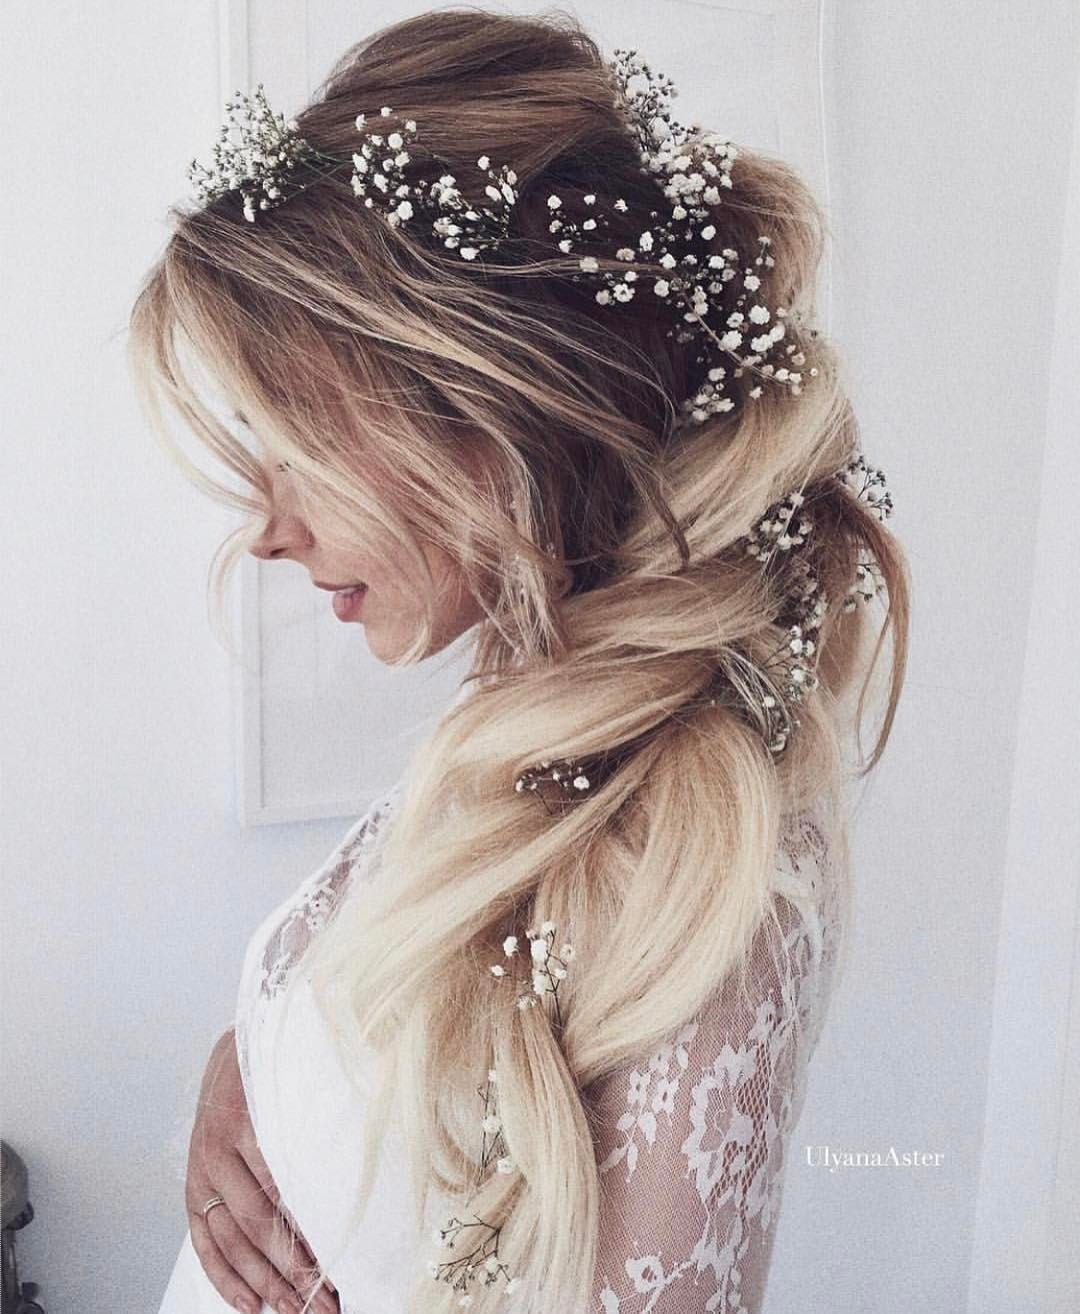 "1,086 Synes godt om, 9 kommentarer – Ulyana Aster (@ulyana.aster) på Instagram: "" #UlyanaAster Amazing #ombre  hair extensions from @ulyana.aster.store"""